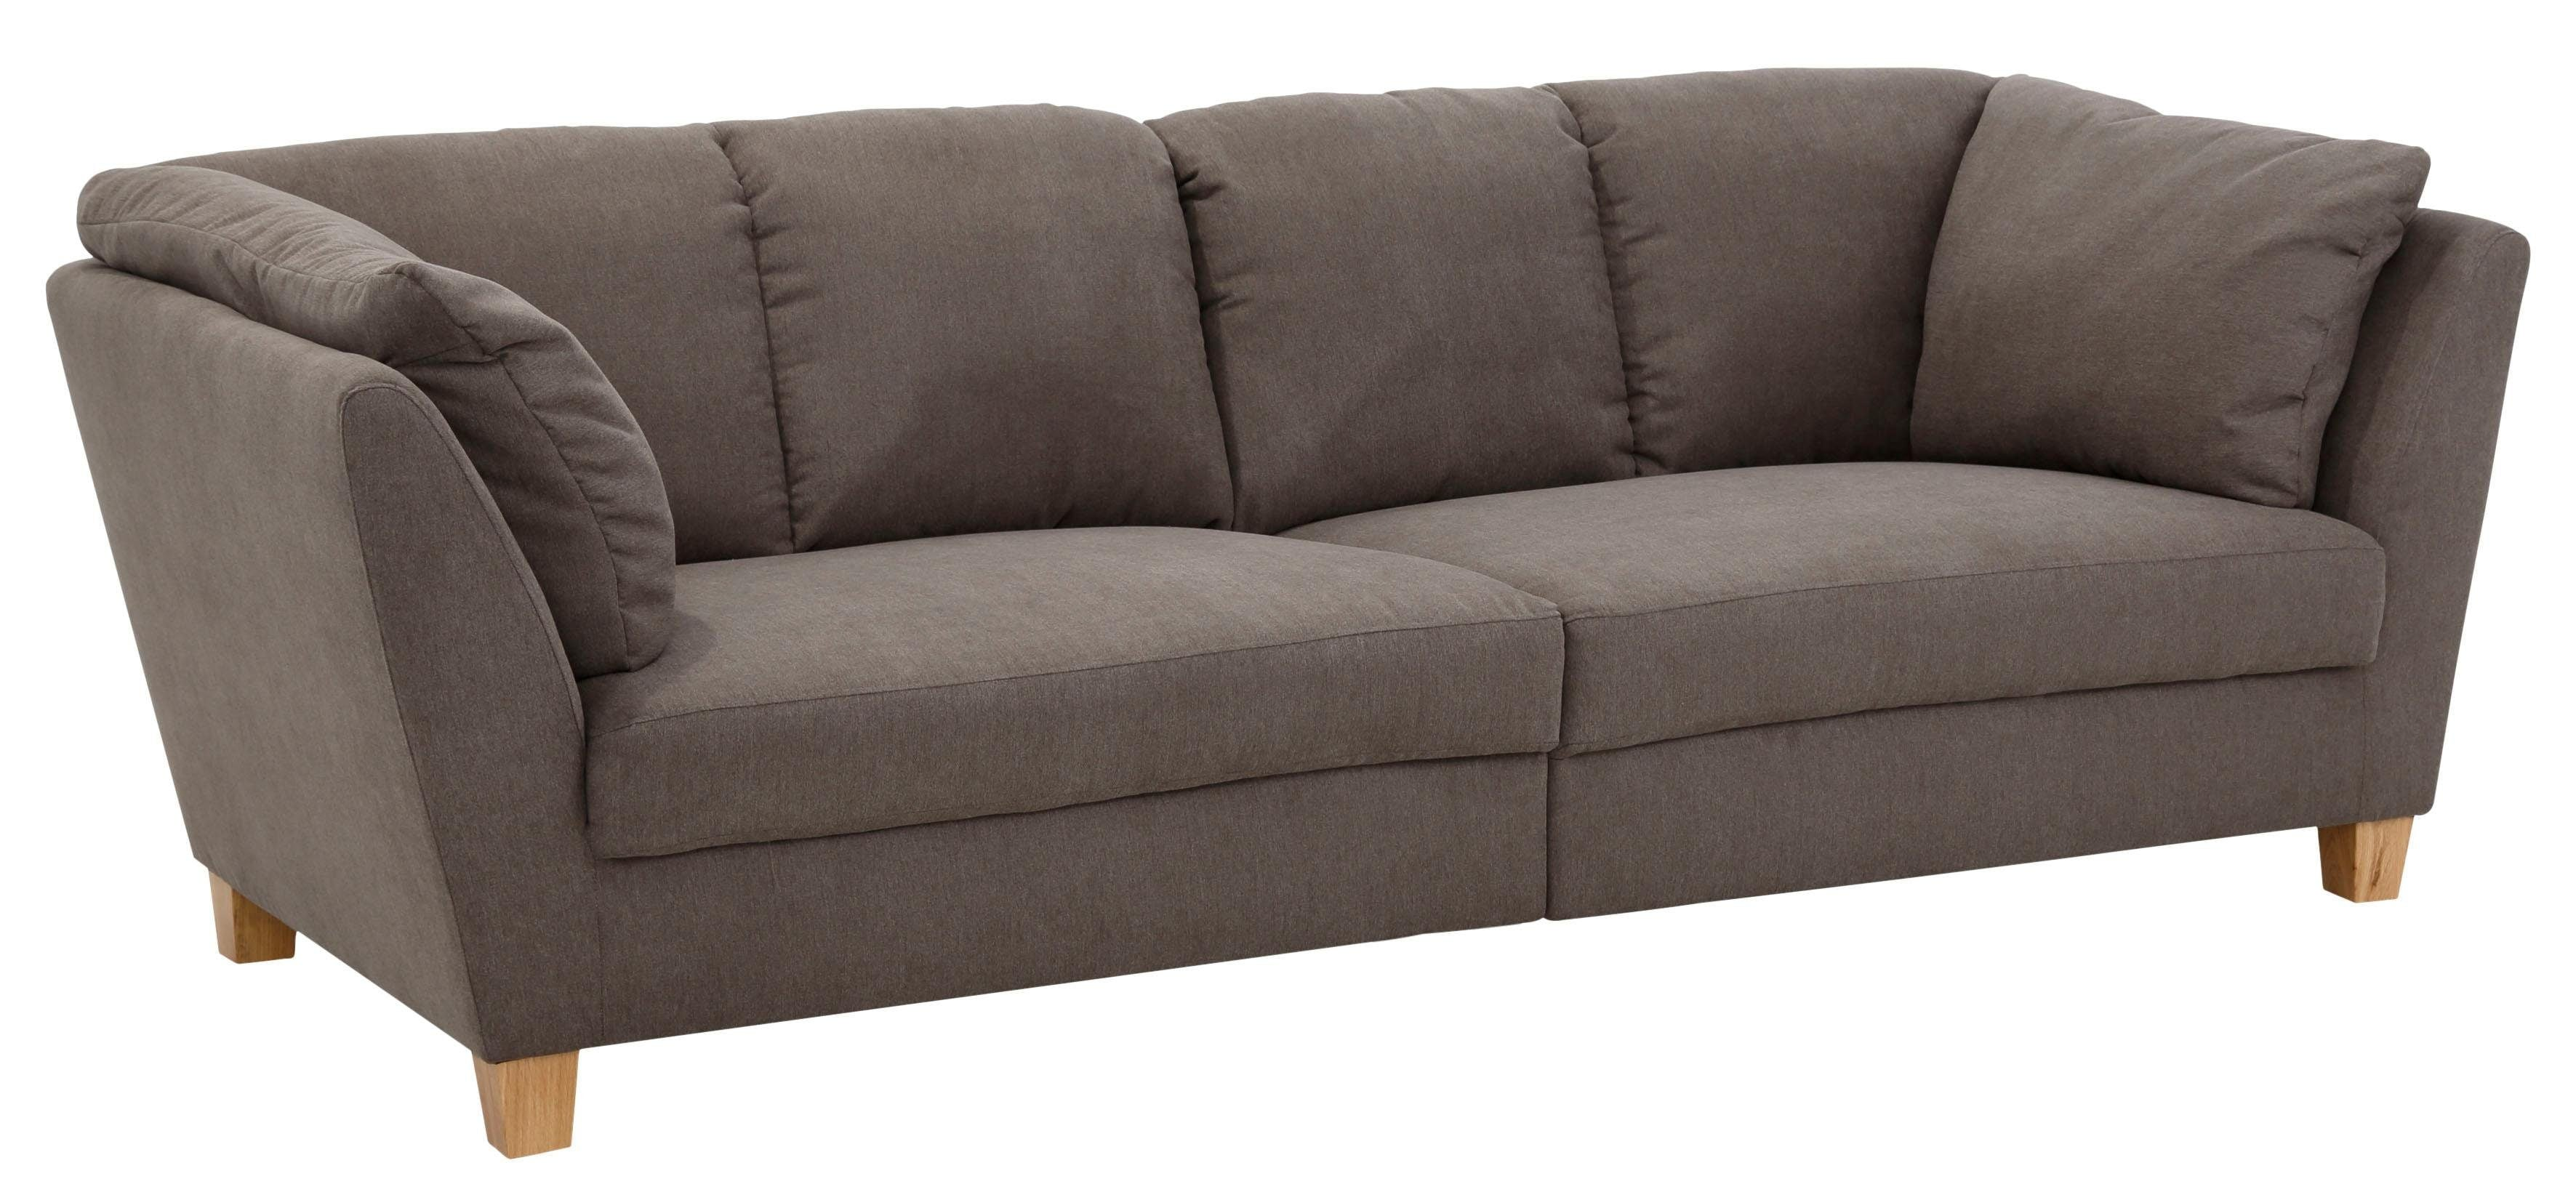 Home affaire Big-Sofa Leeven